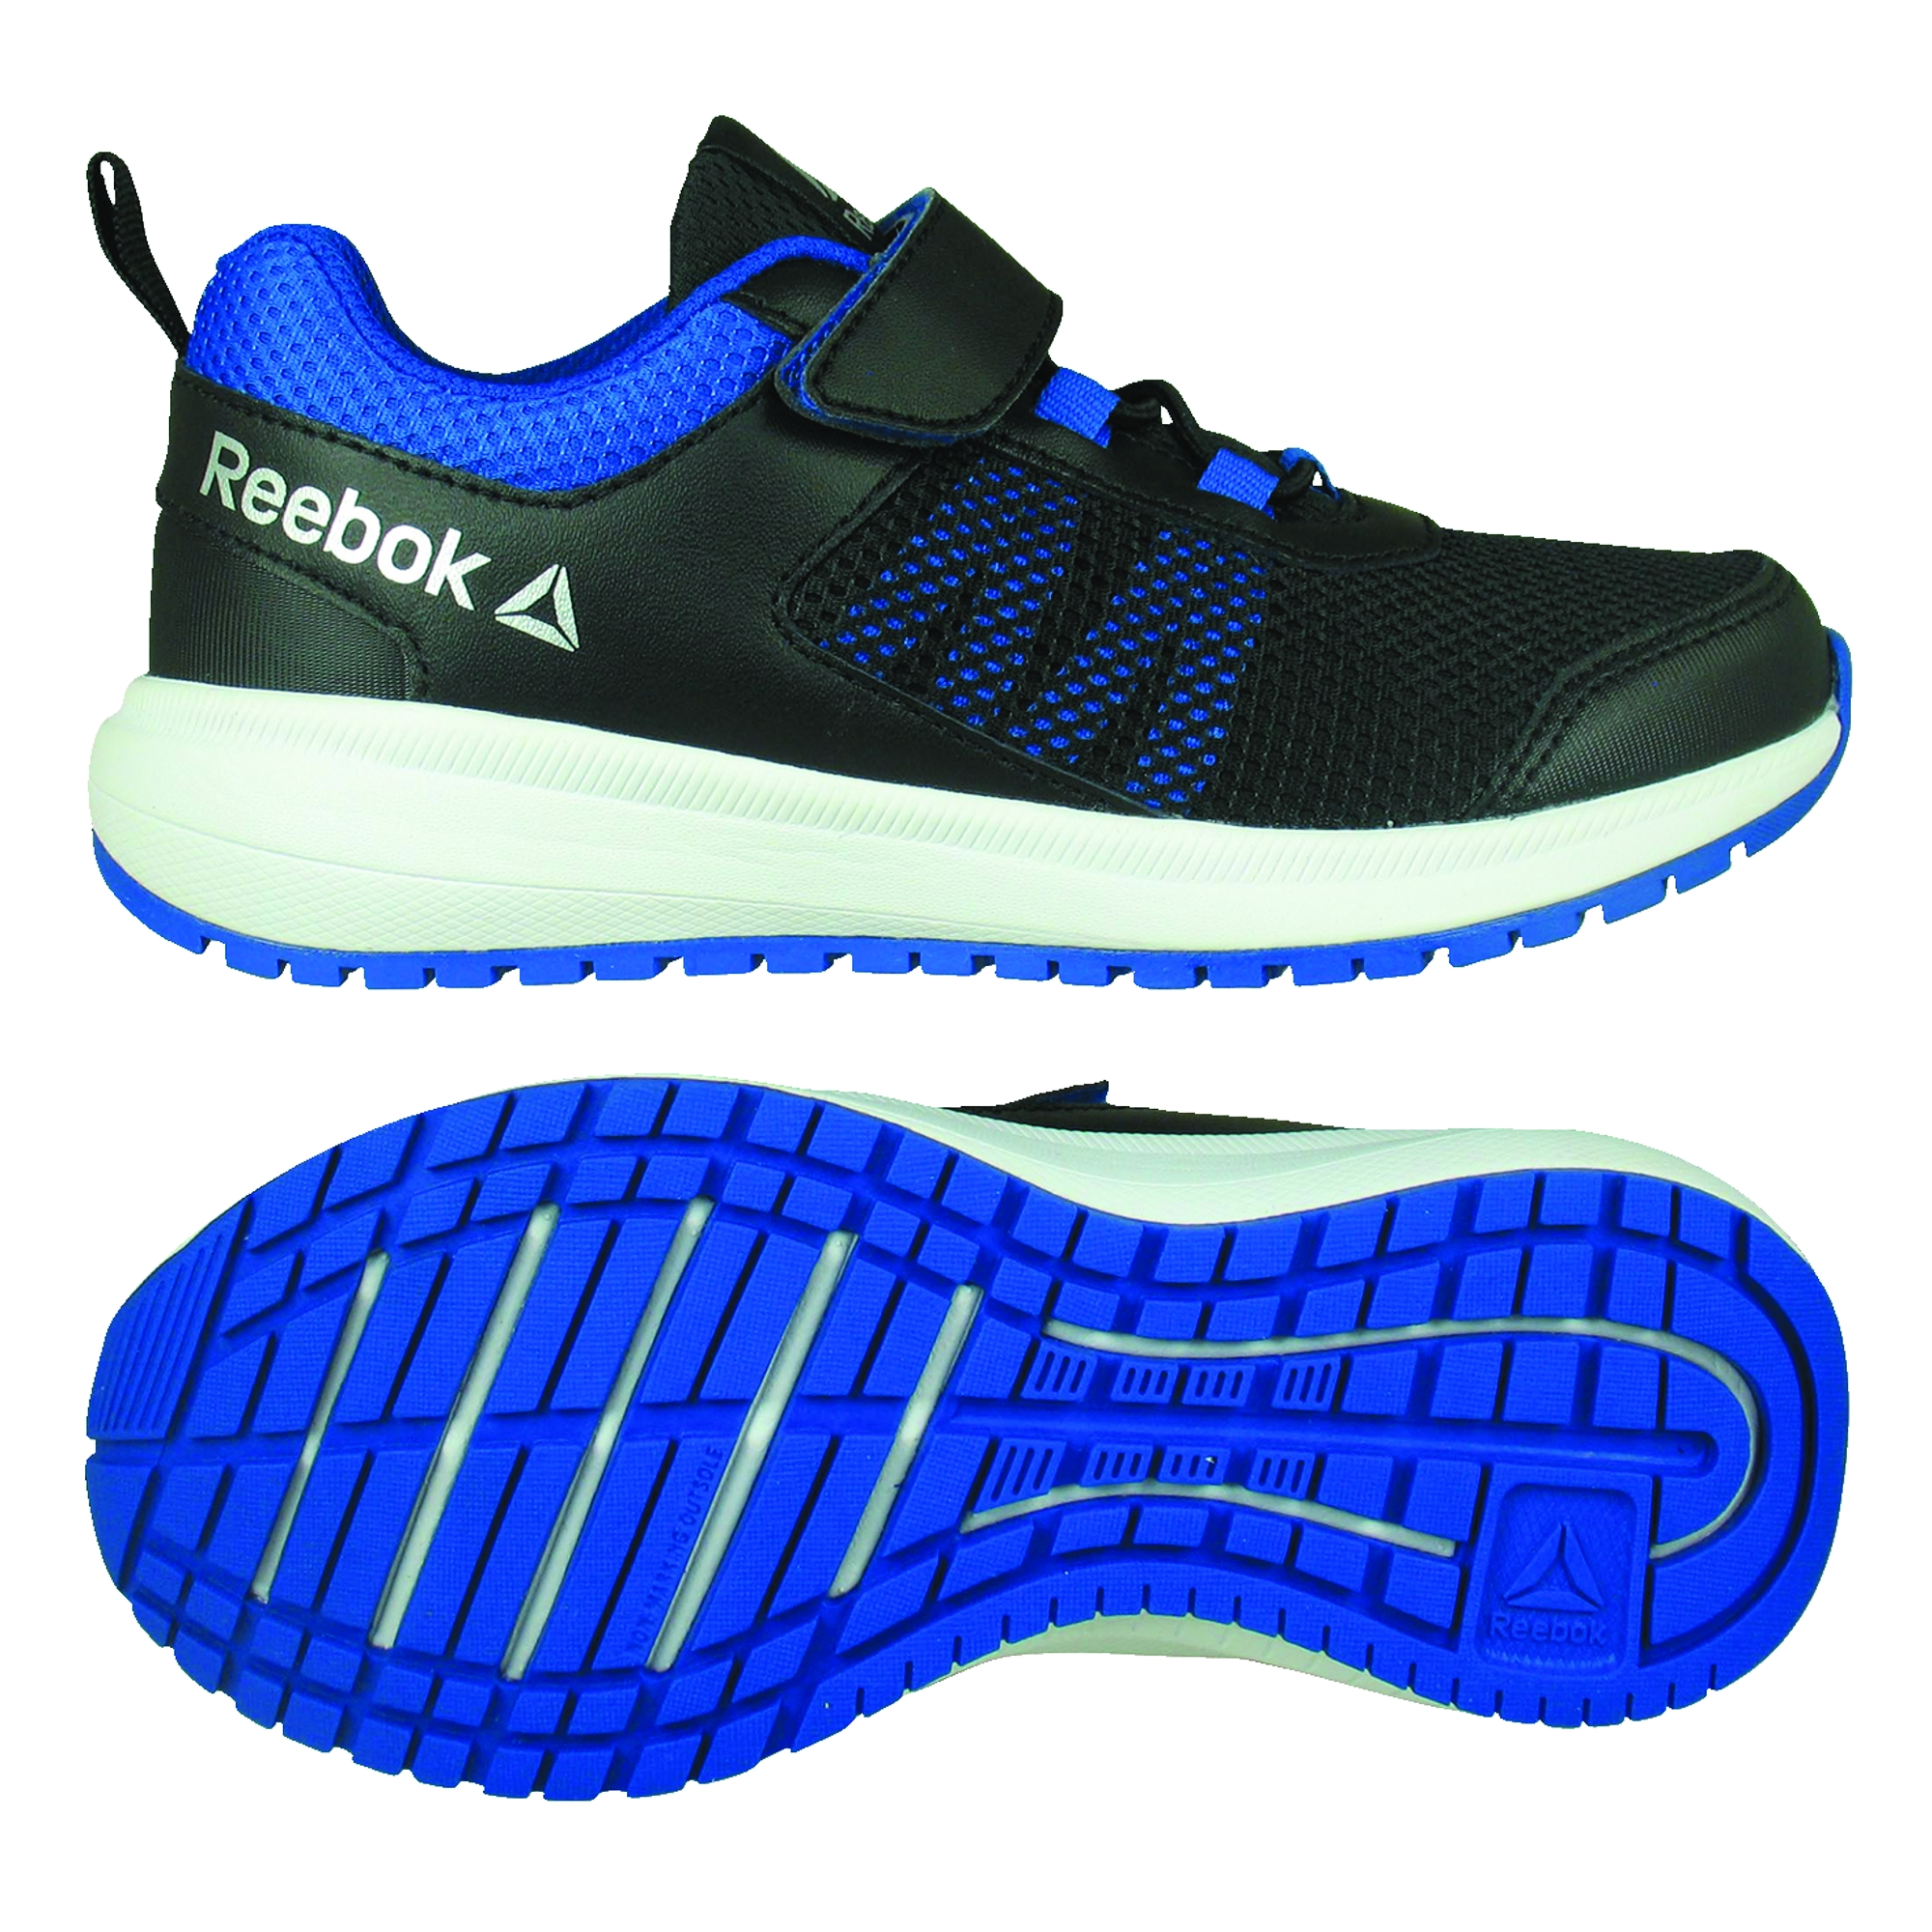 a6edc5e340578b Chaussures kid Reebok Road Supreme Alt